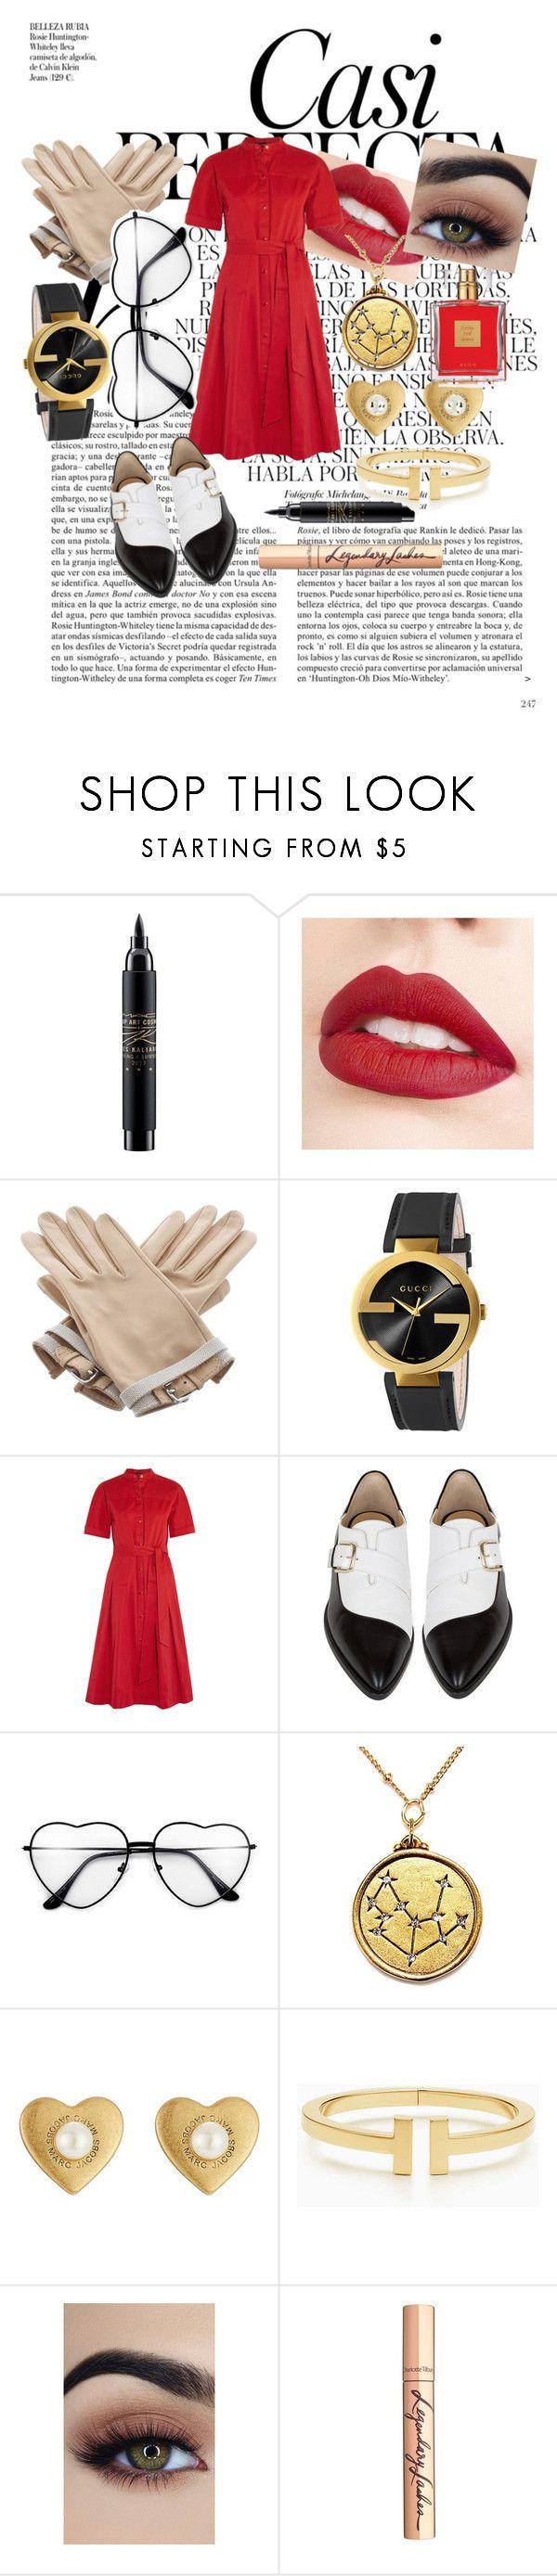 """Little red dress"" by eva-l118 ❤ liked on Polyvore featuring Whiteley, MAC Cosmetics, Jouer, Hermès, Gucci, Vanessa Seward, Bionda Castana, Marc Jacobs, Tiffany & Co. and Charlotte Tilbury"